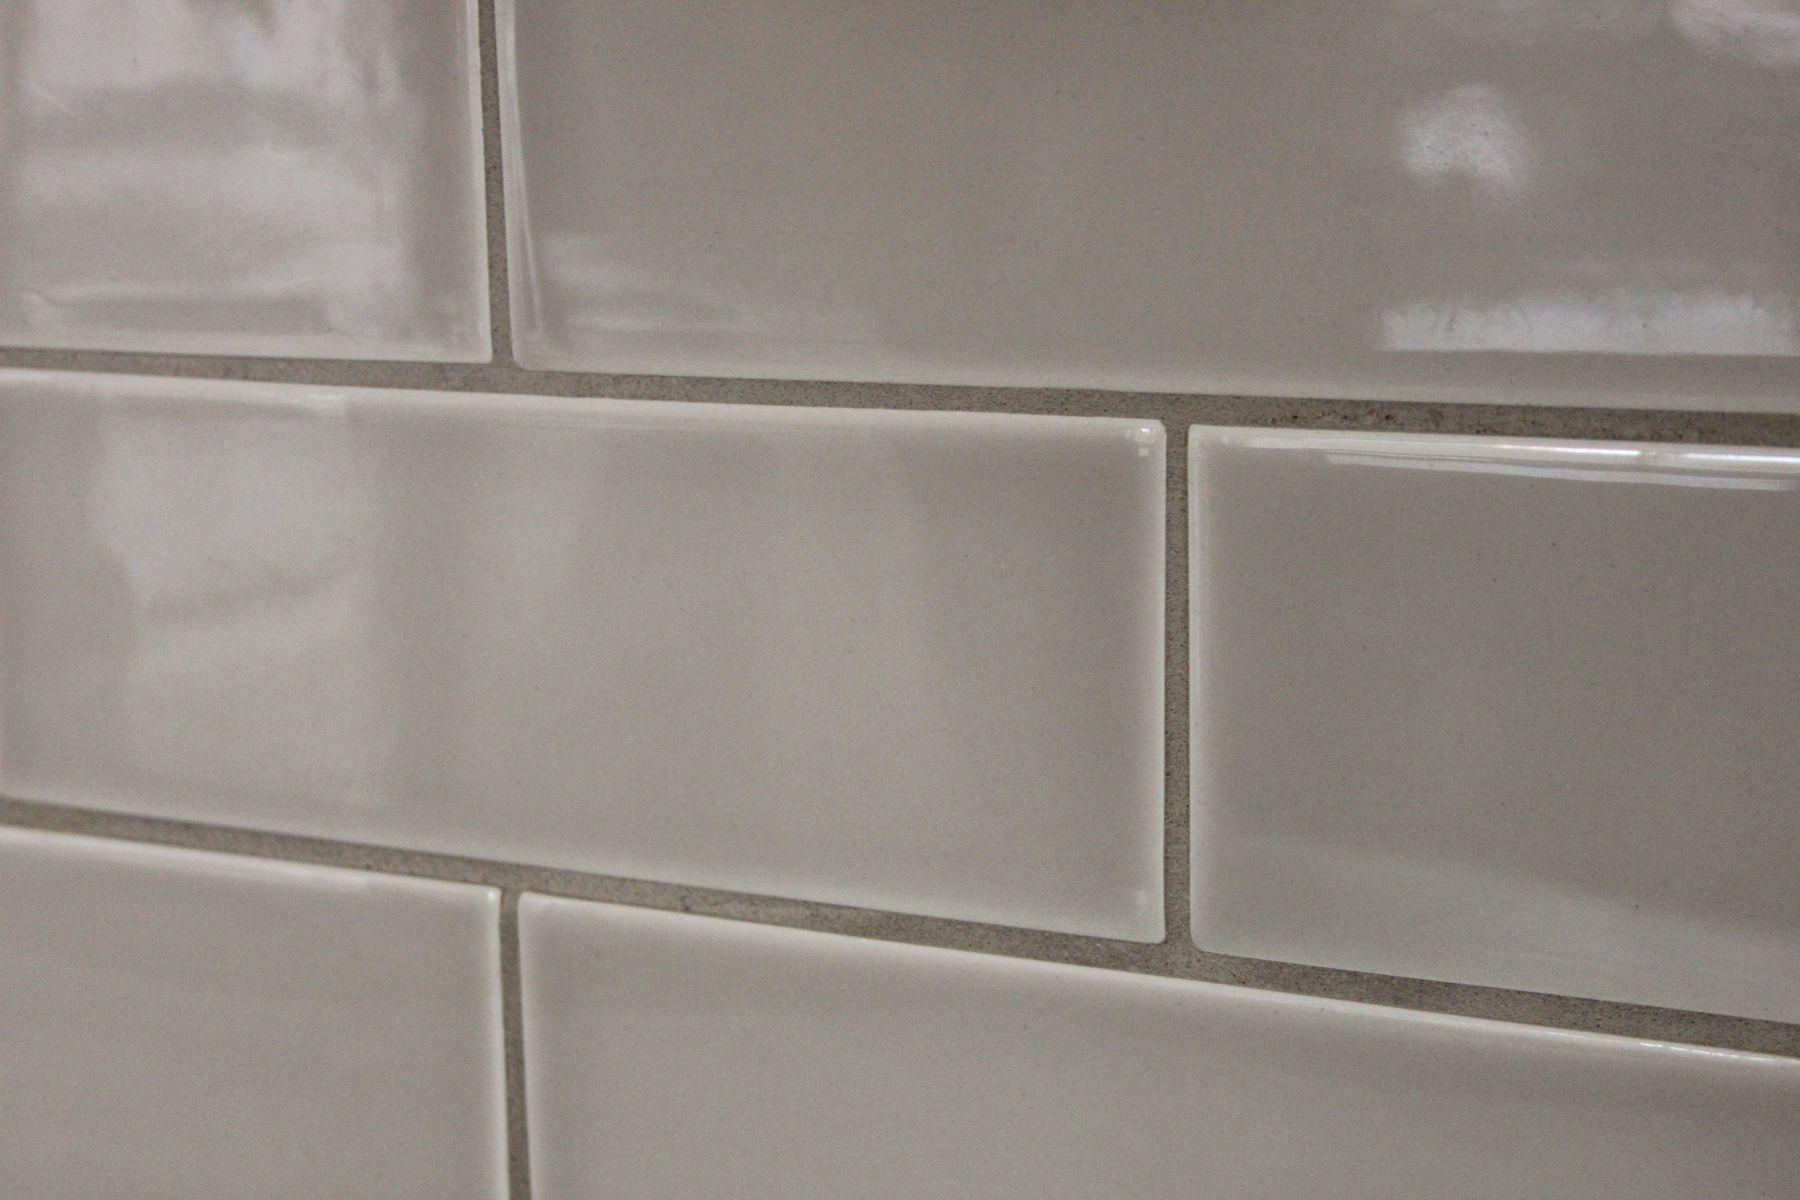 - Gray Ceramic Subway Tile - Google Search Grey Subway Tiles